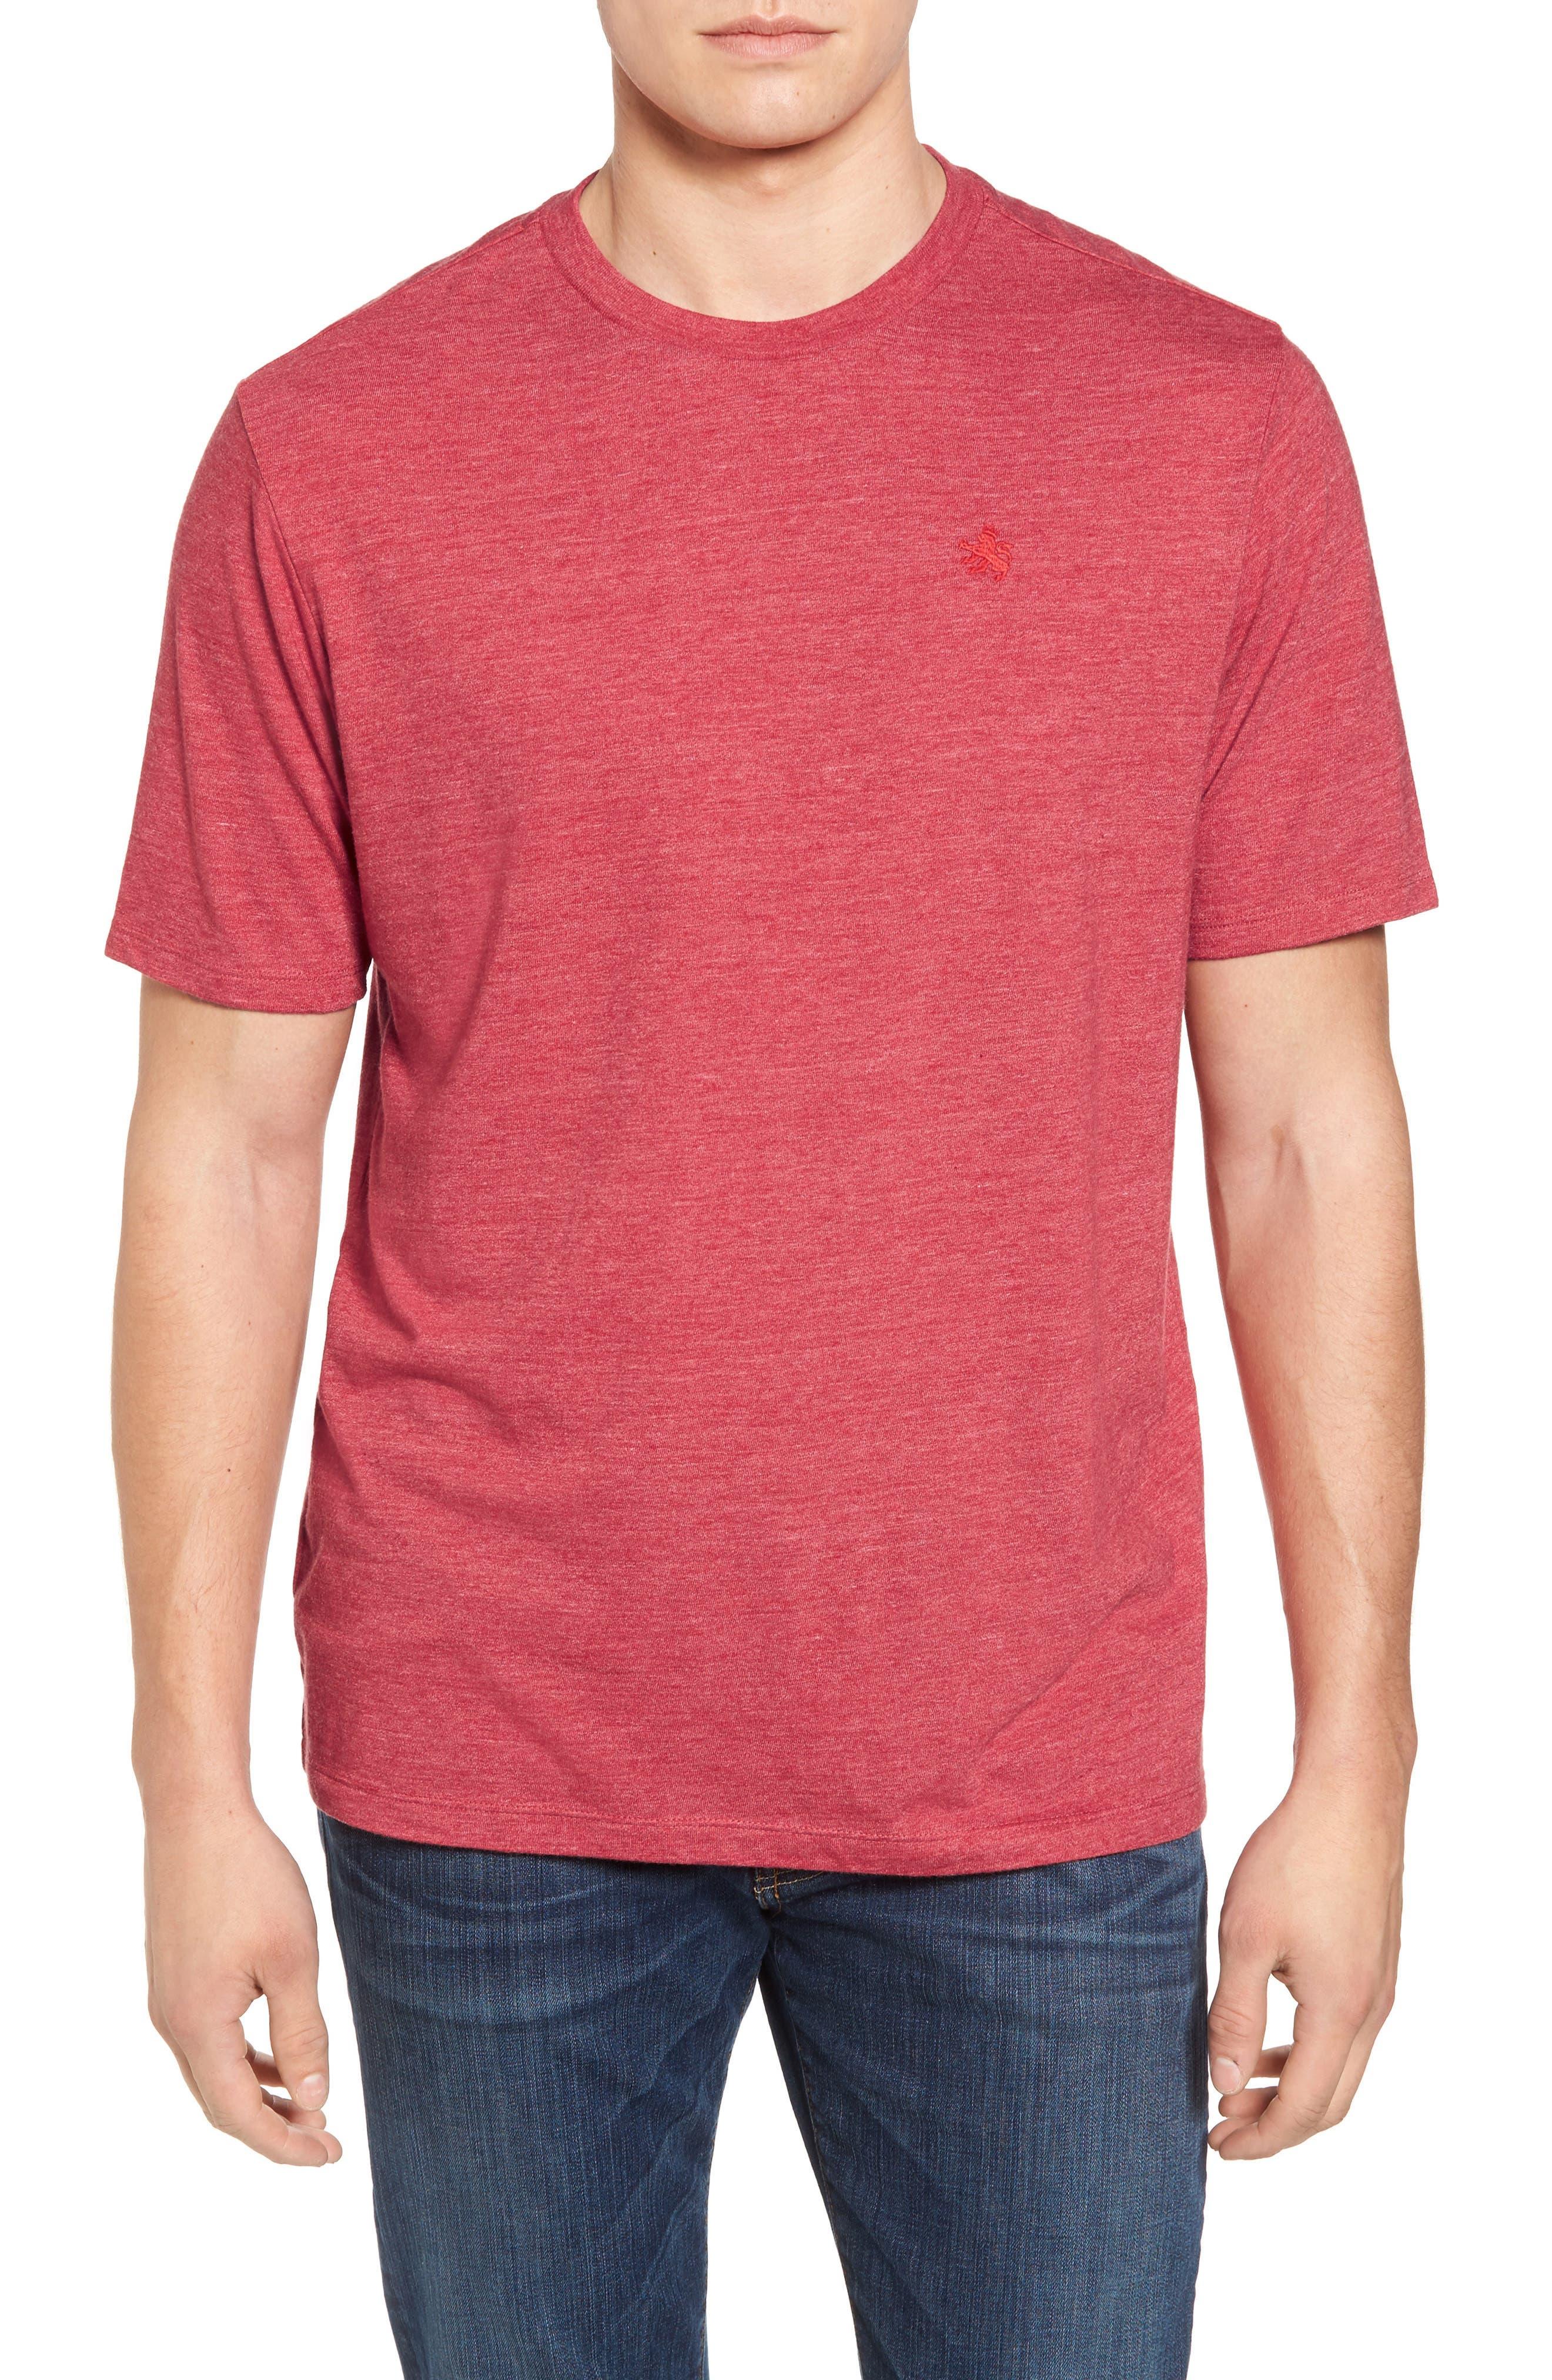 Main Image - Nat Nast For the Good Life Graphic T-Shirt